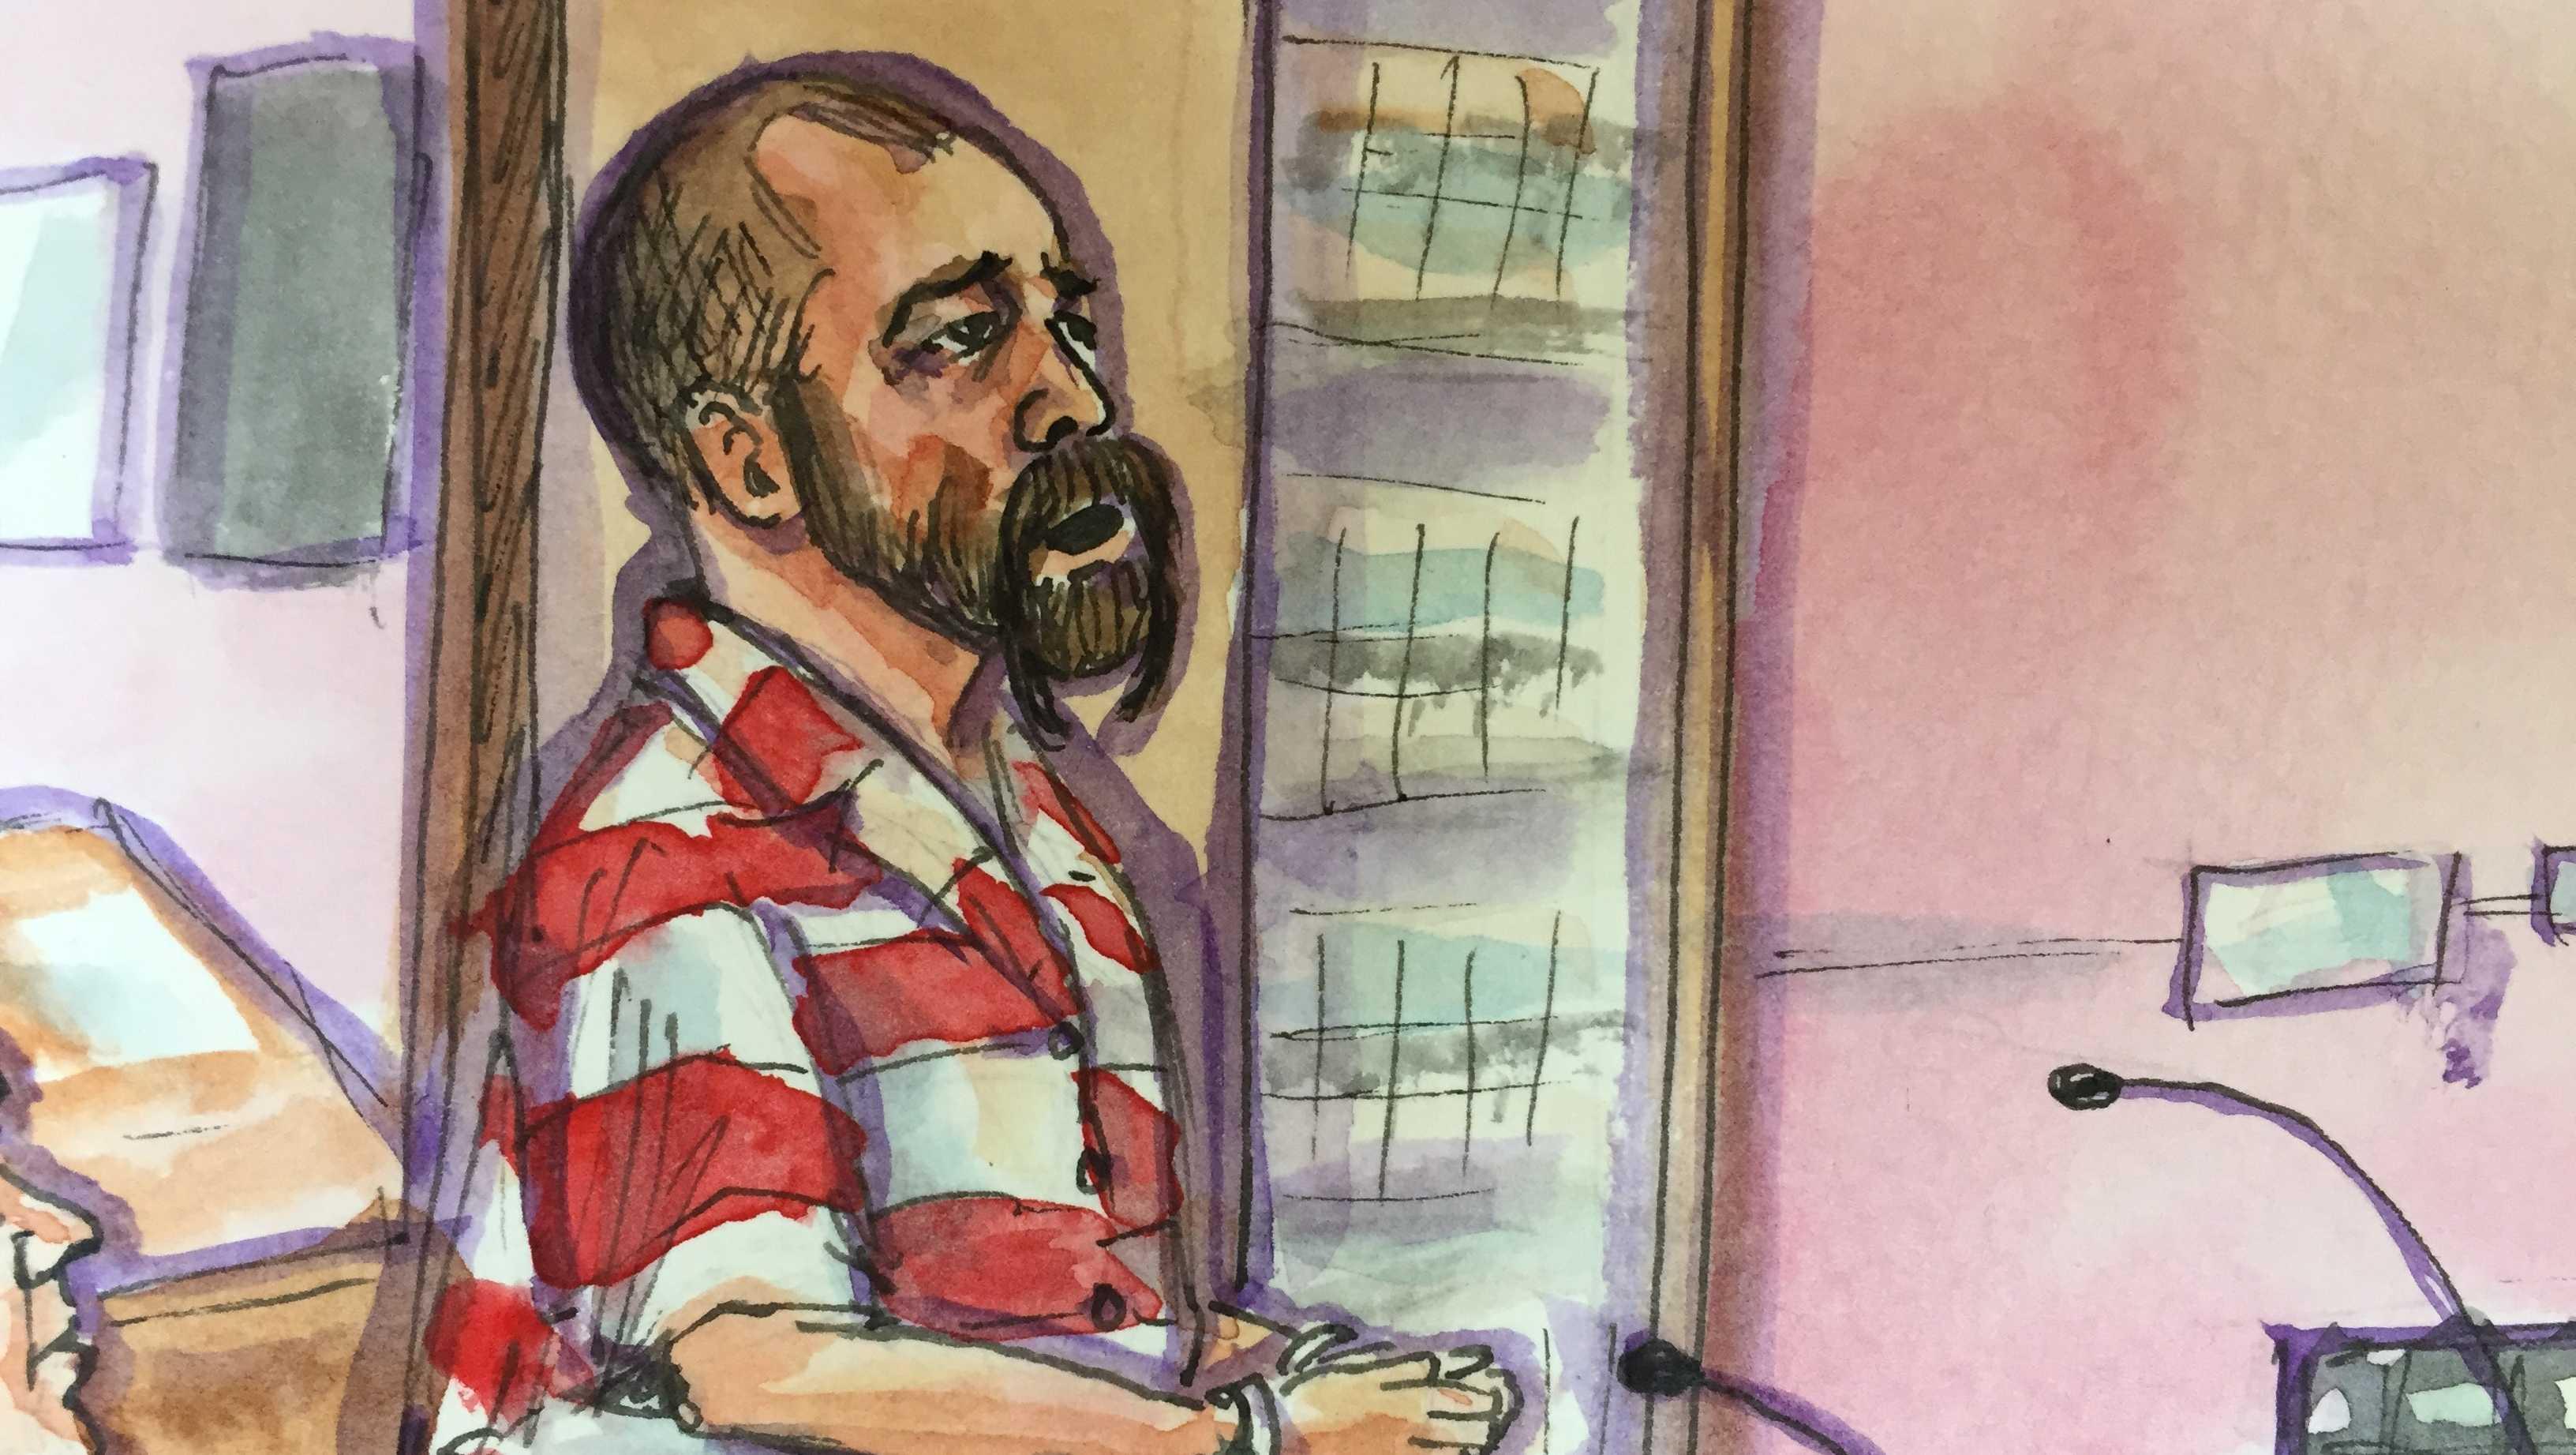 David Machado in court (Nov. 21, 2016)